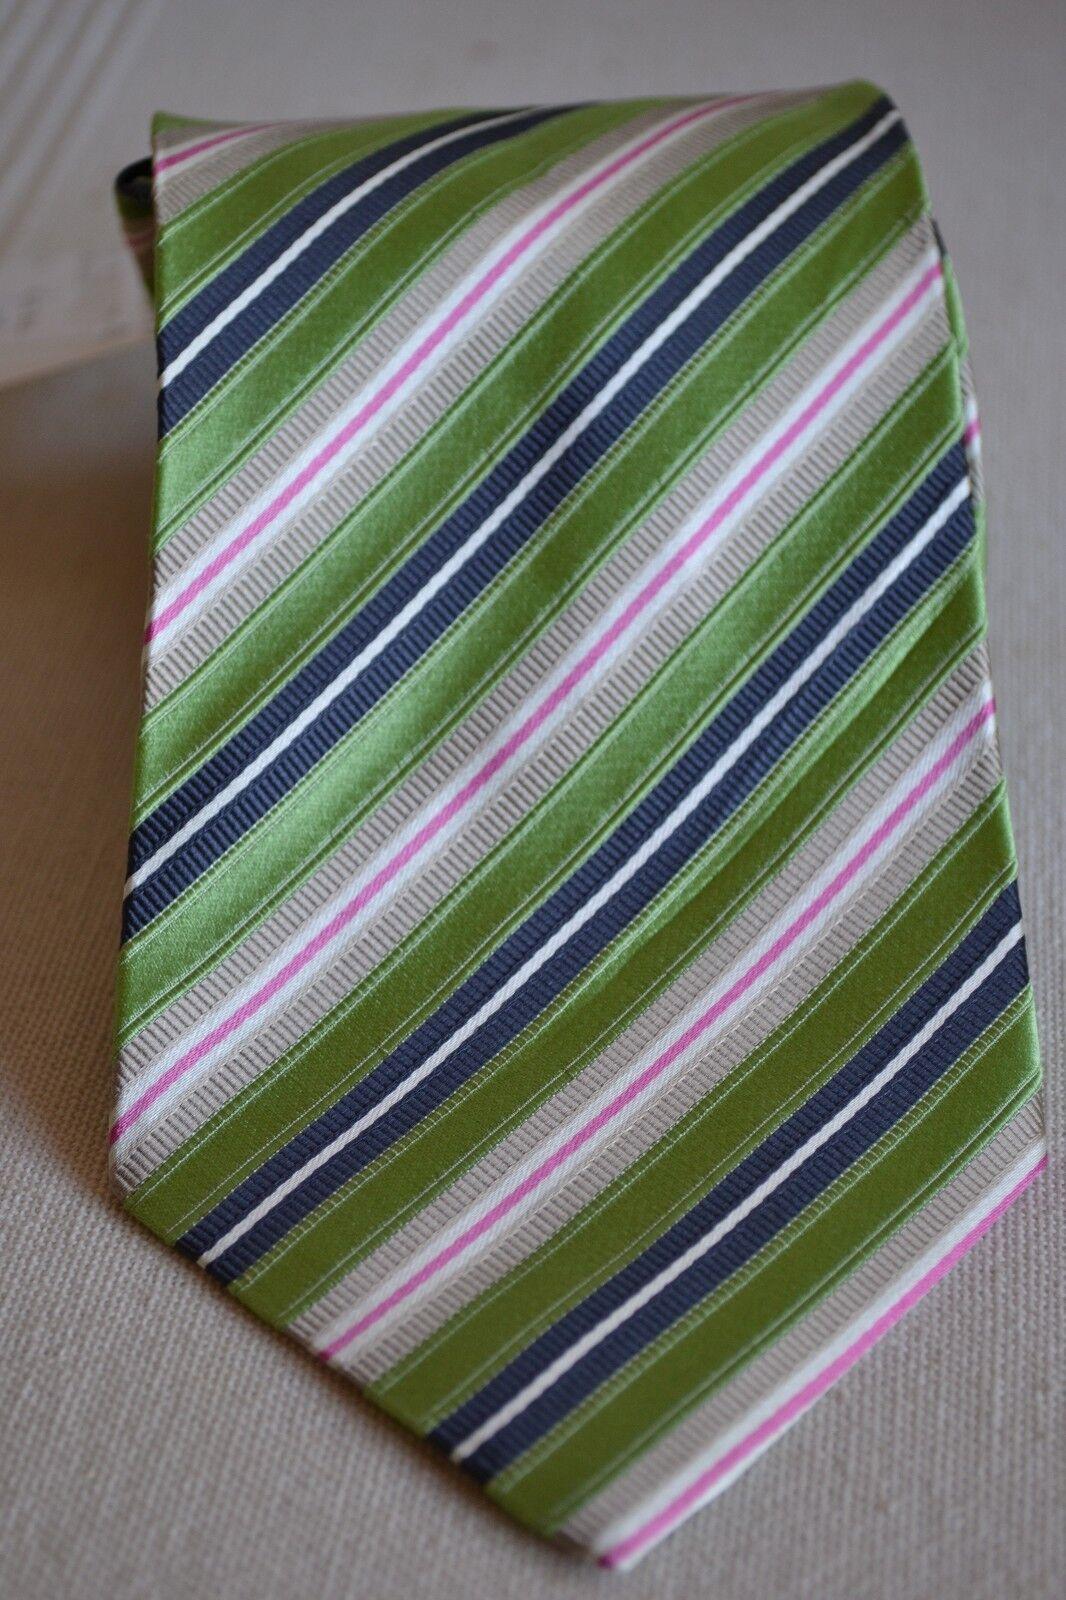 Zegna Designer Krawatte CORBATA NEU 95% Seide silk TIE grün grau weiß Rosa NEW | Neuheit Spielzeug